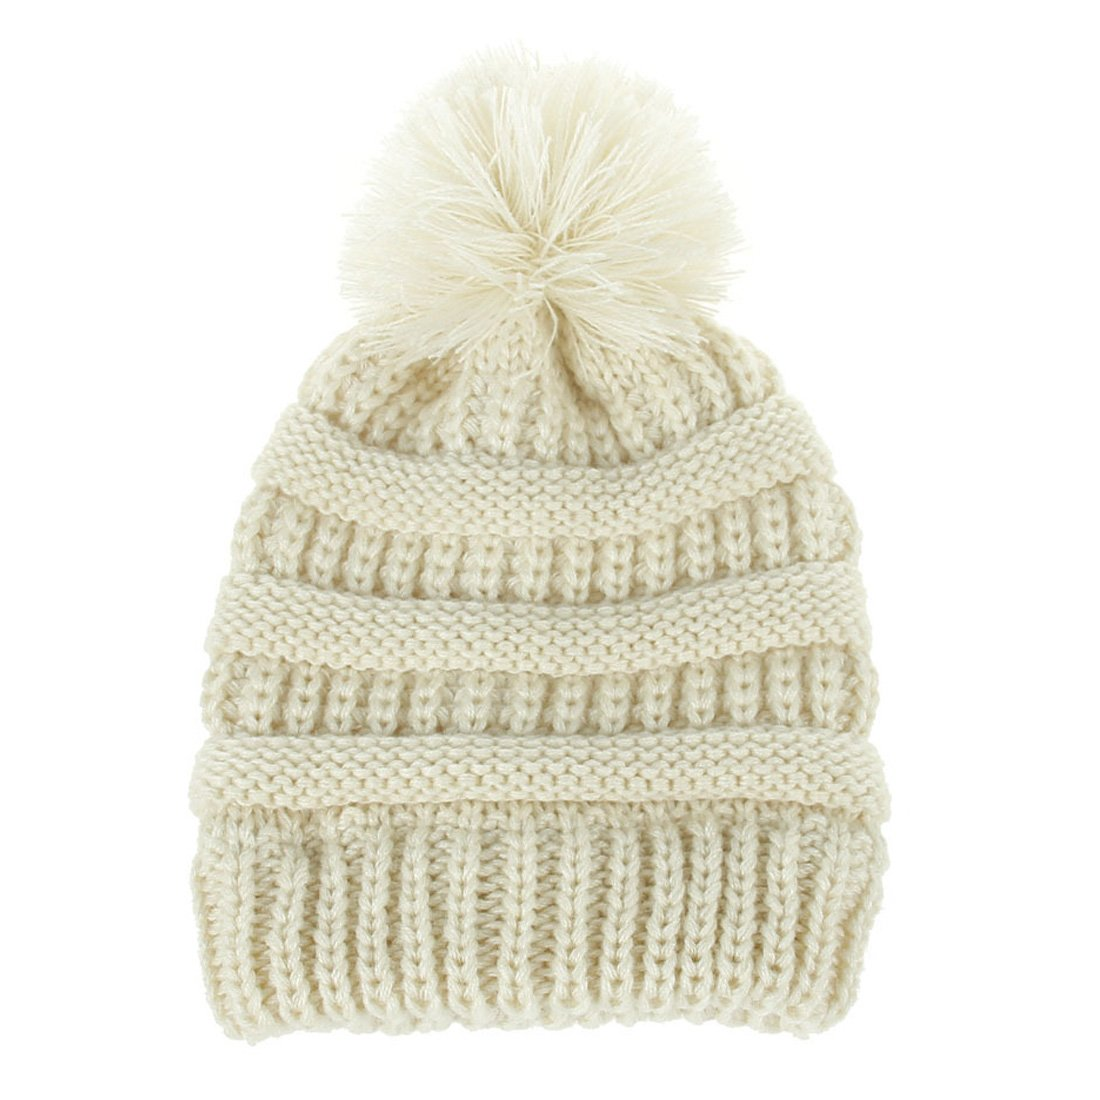 Topcoco Newborn Baby Girls Boys Winter Hat Knitted Pom Pom Skull Caps